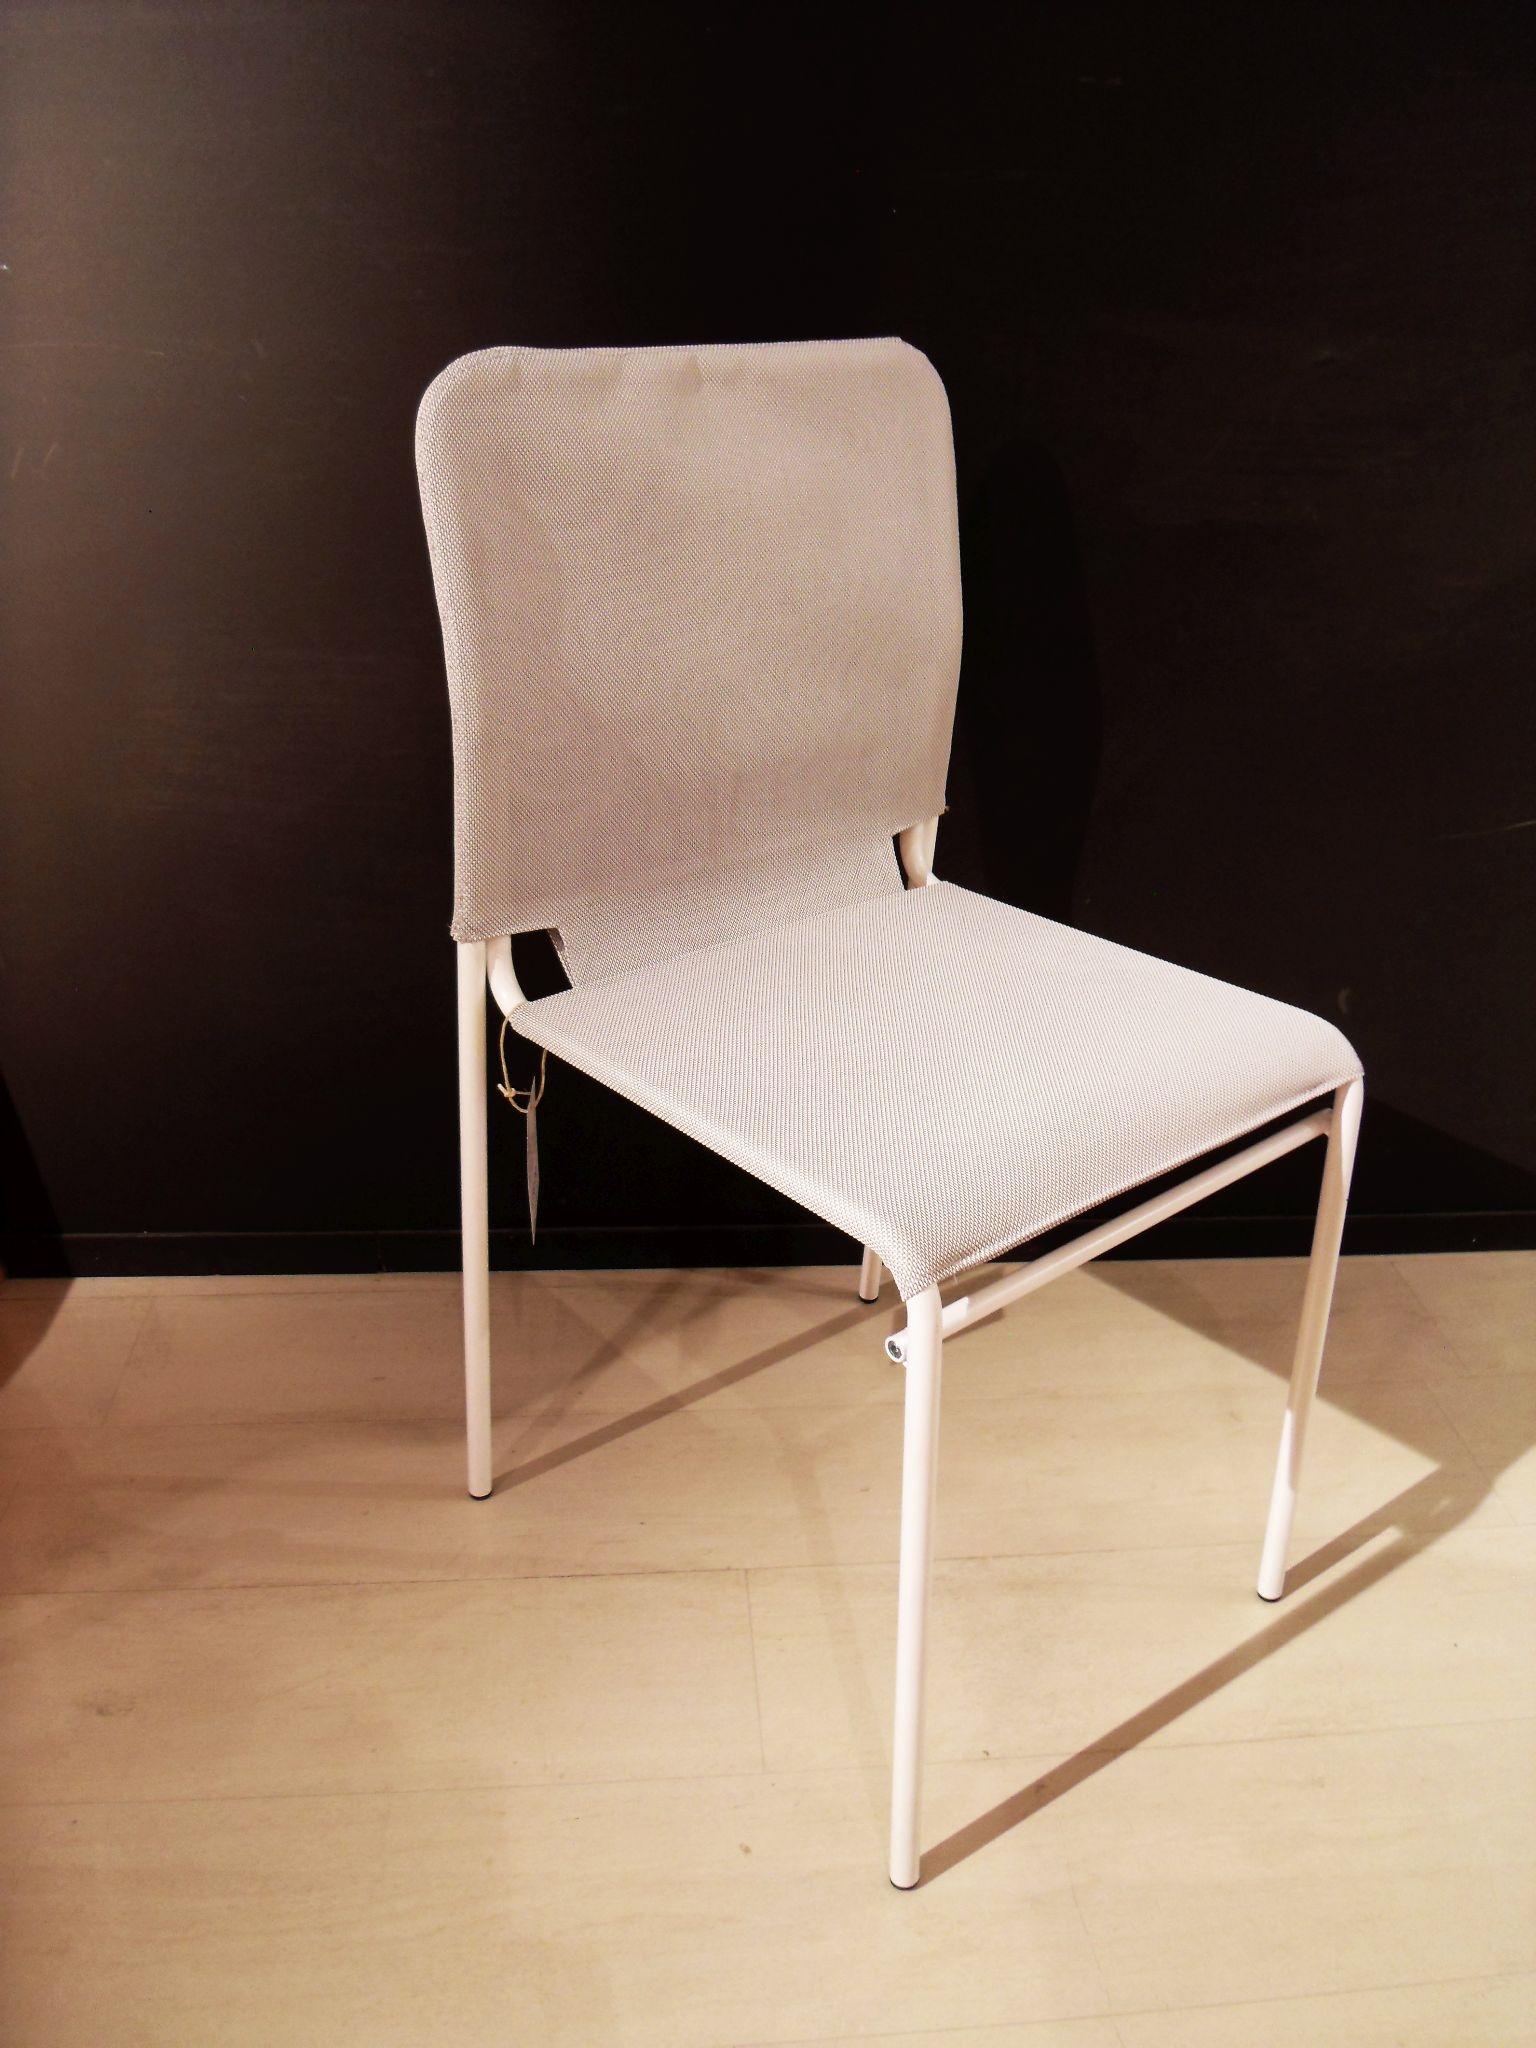 Offerta 4 sedie mod ten sintesi design sedie a prezzi for Offerta sedie design